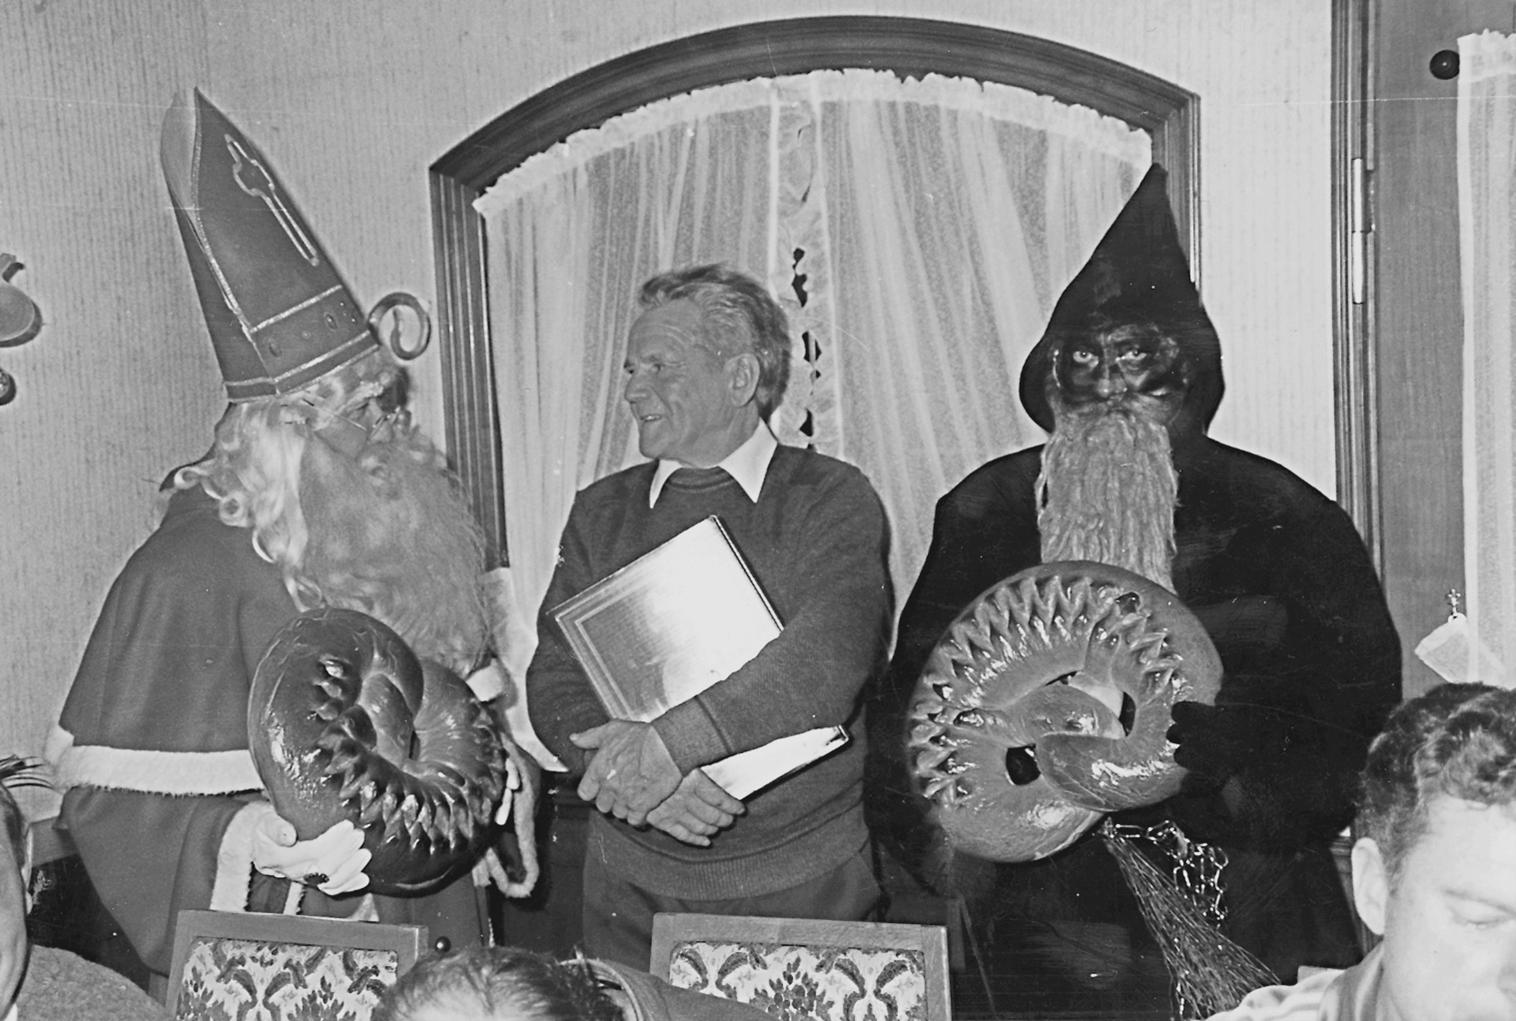 Dezember 1985 Nikolaus